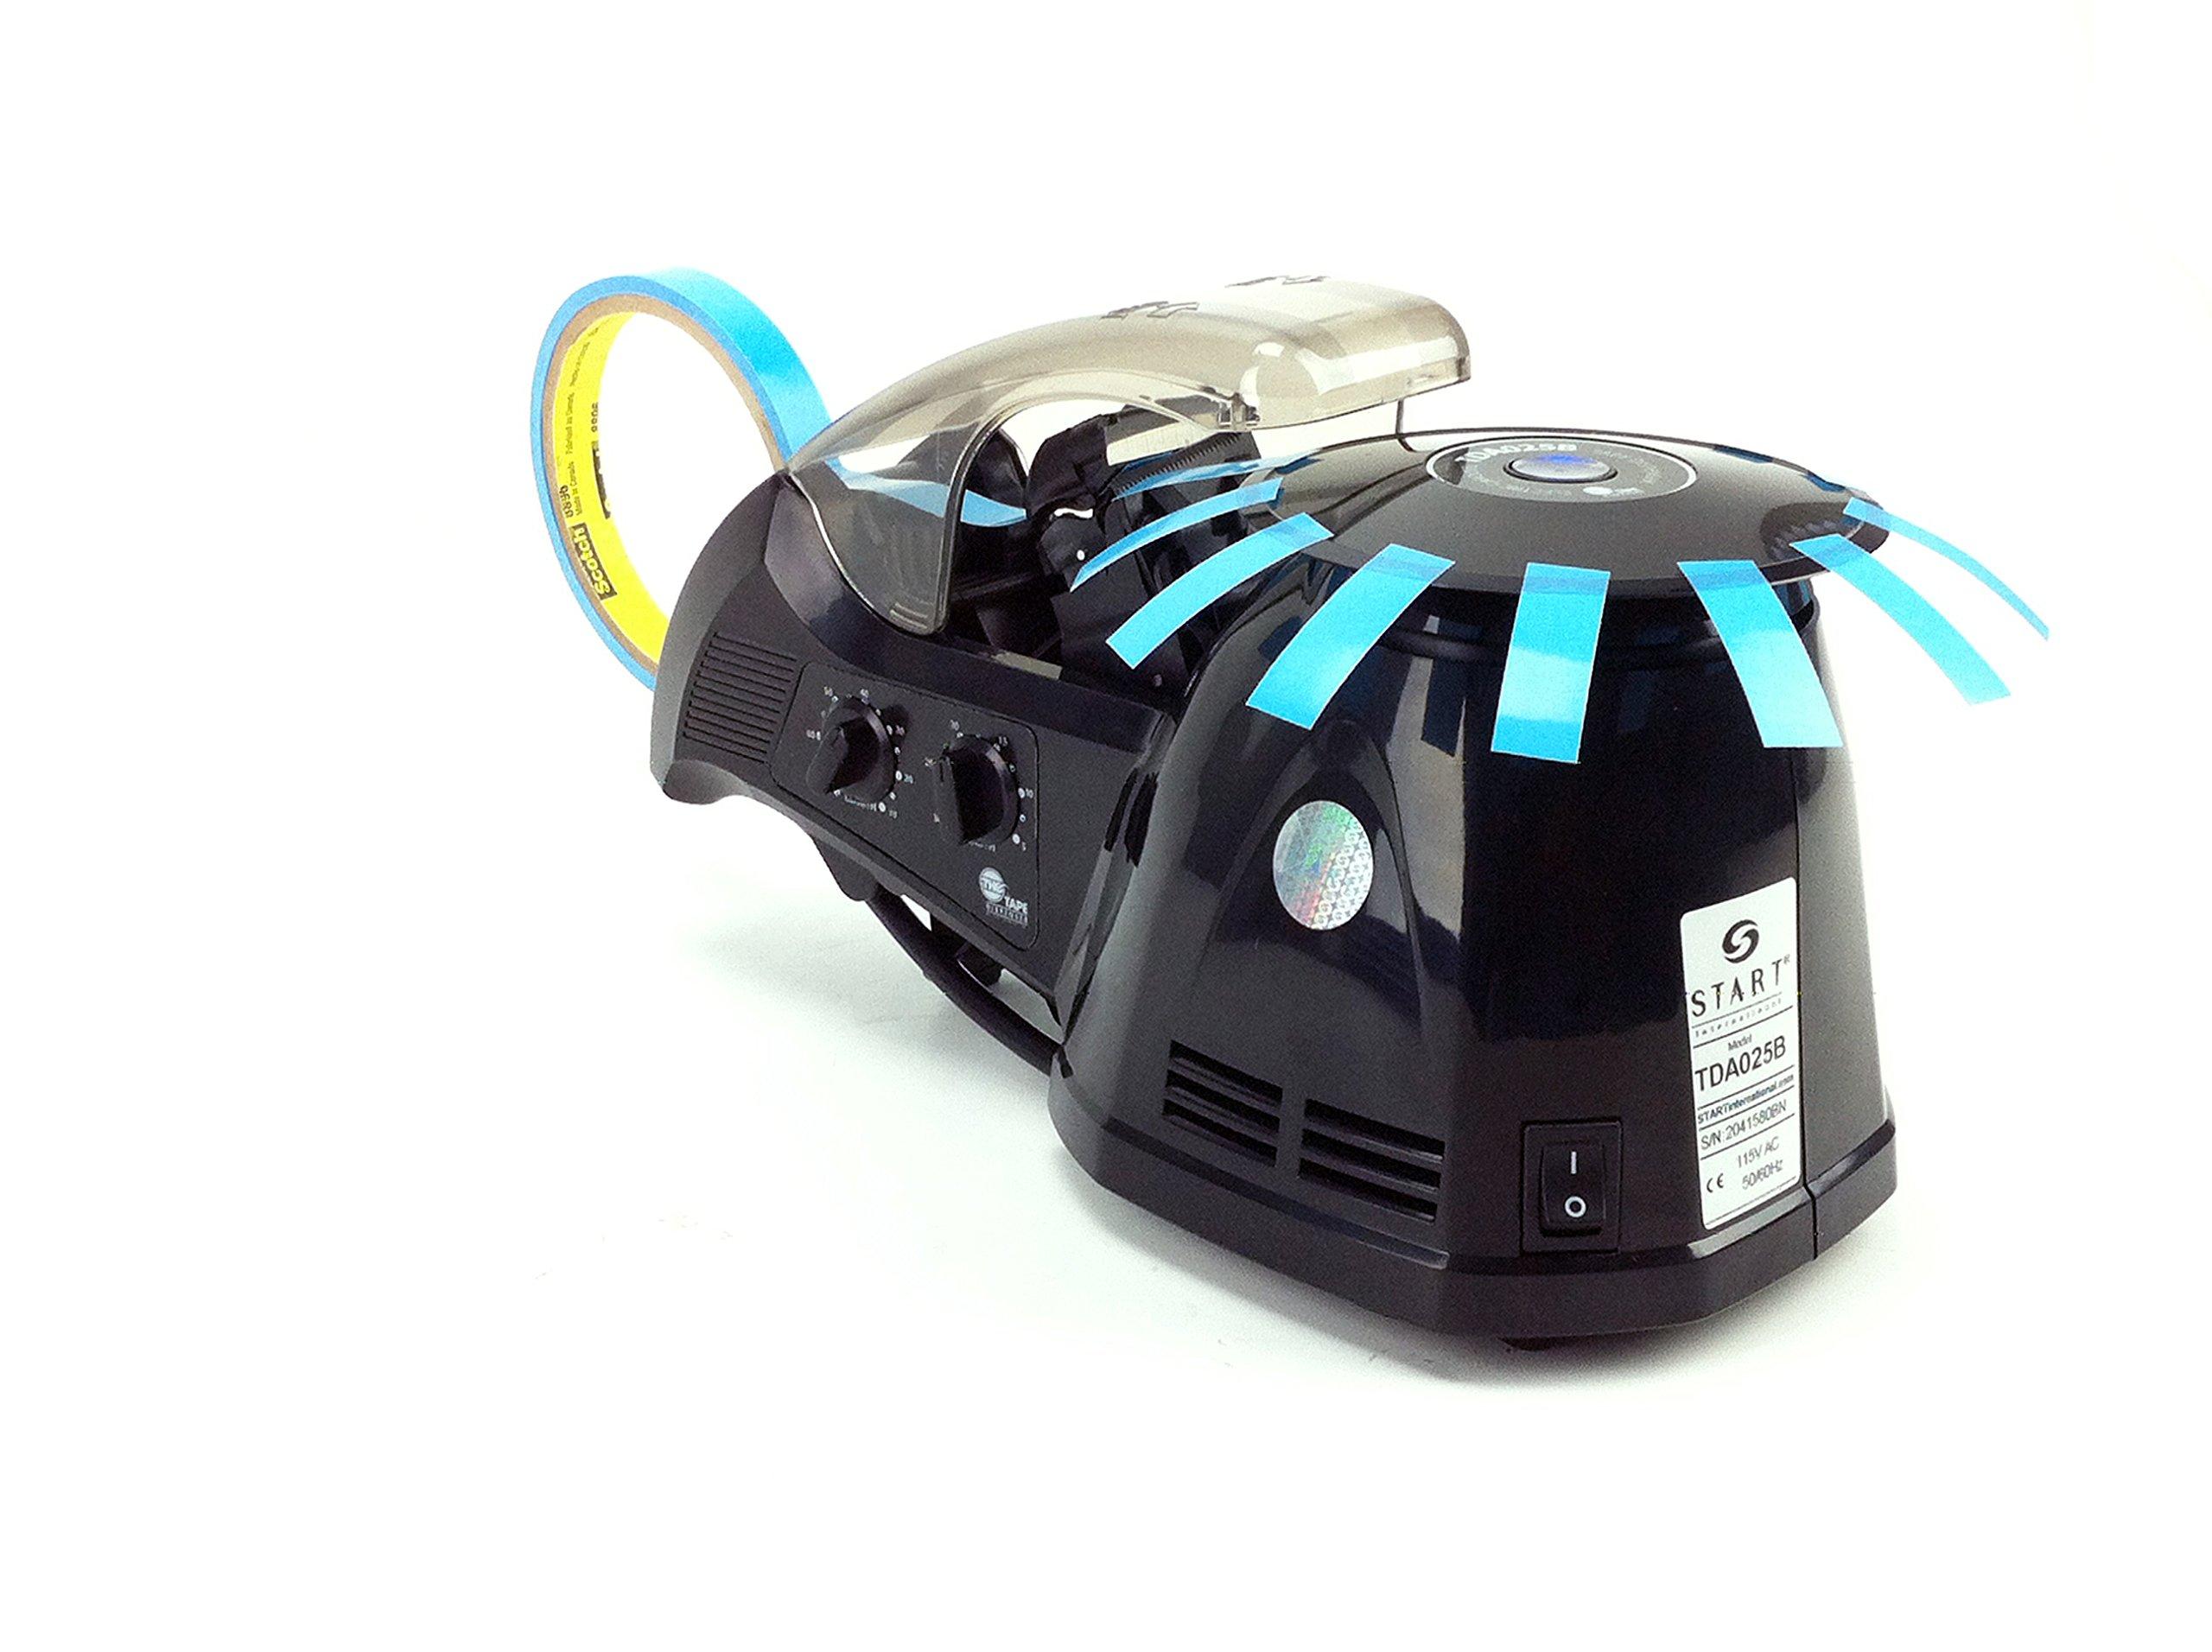 START International TDA025B Electric Carousel Tape Dispenser, 11.8'' Length x 6.3'' Width x 6.3'' Height